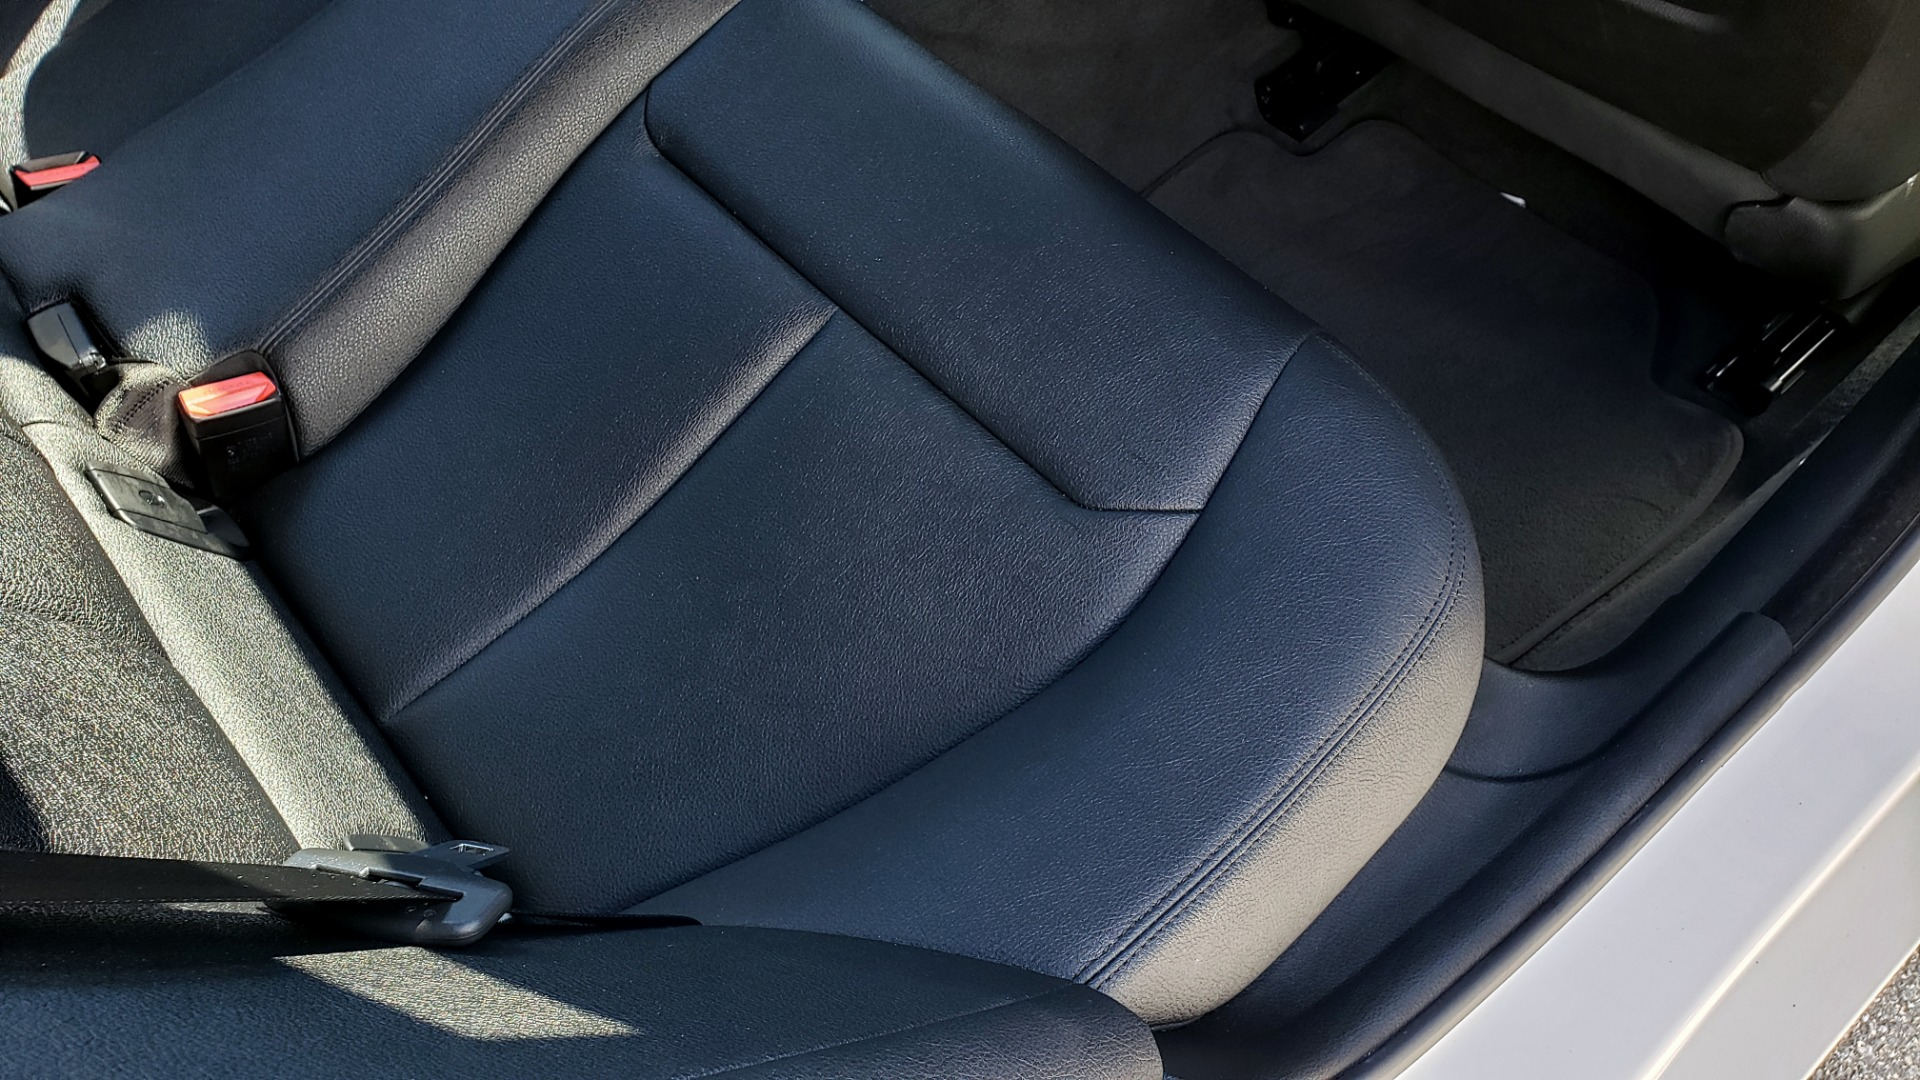 Used 2018 BMW 4 SERIES 430IXDRIVE / PREMIUM / NAV / SUNROOF / ESSENTIALS PKG for sale $27,795 at Formula Imports in Charlotte NC 28227 75